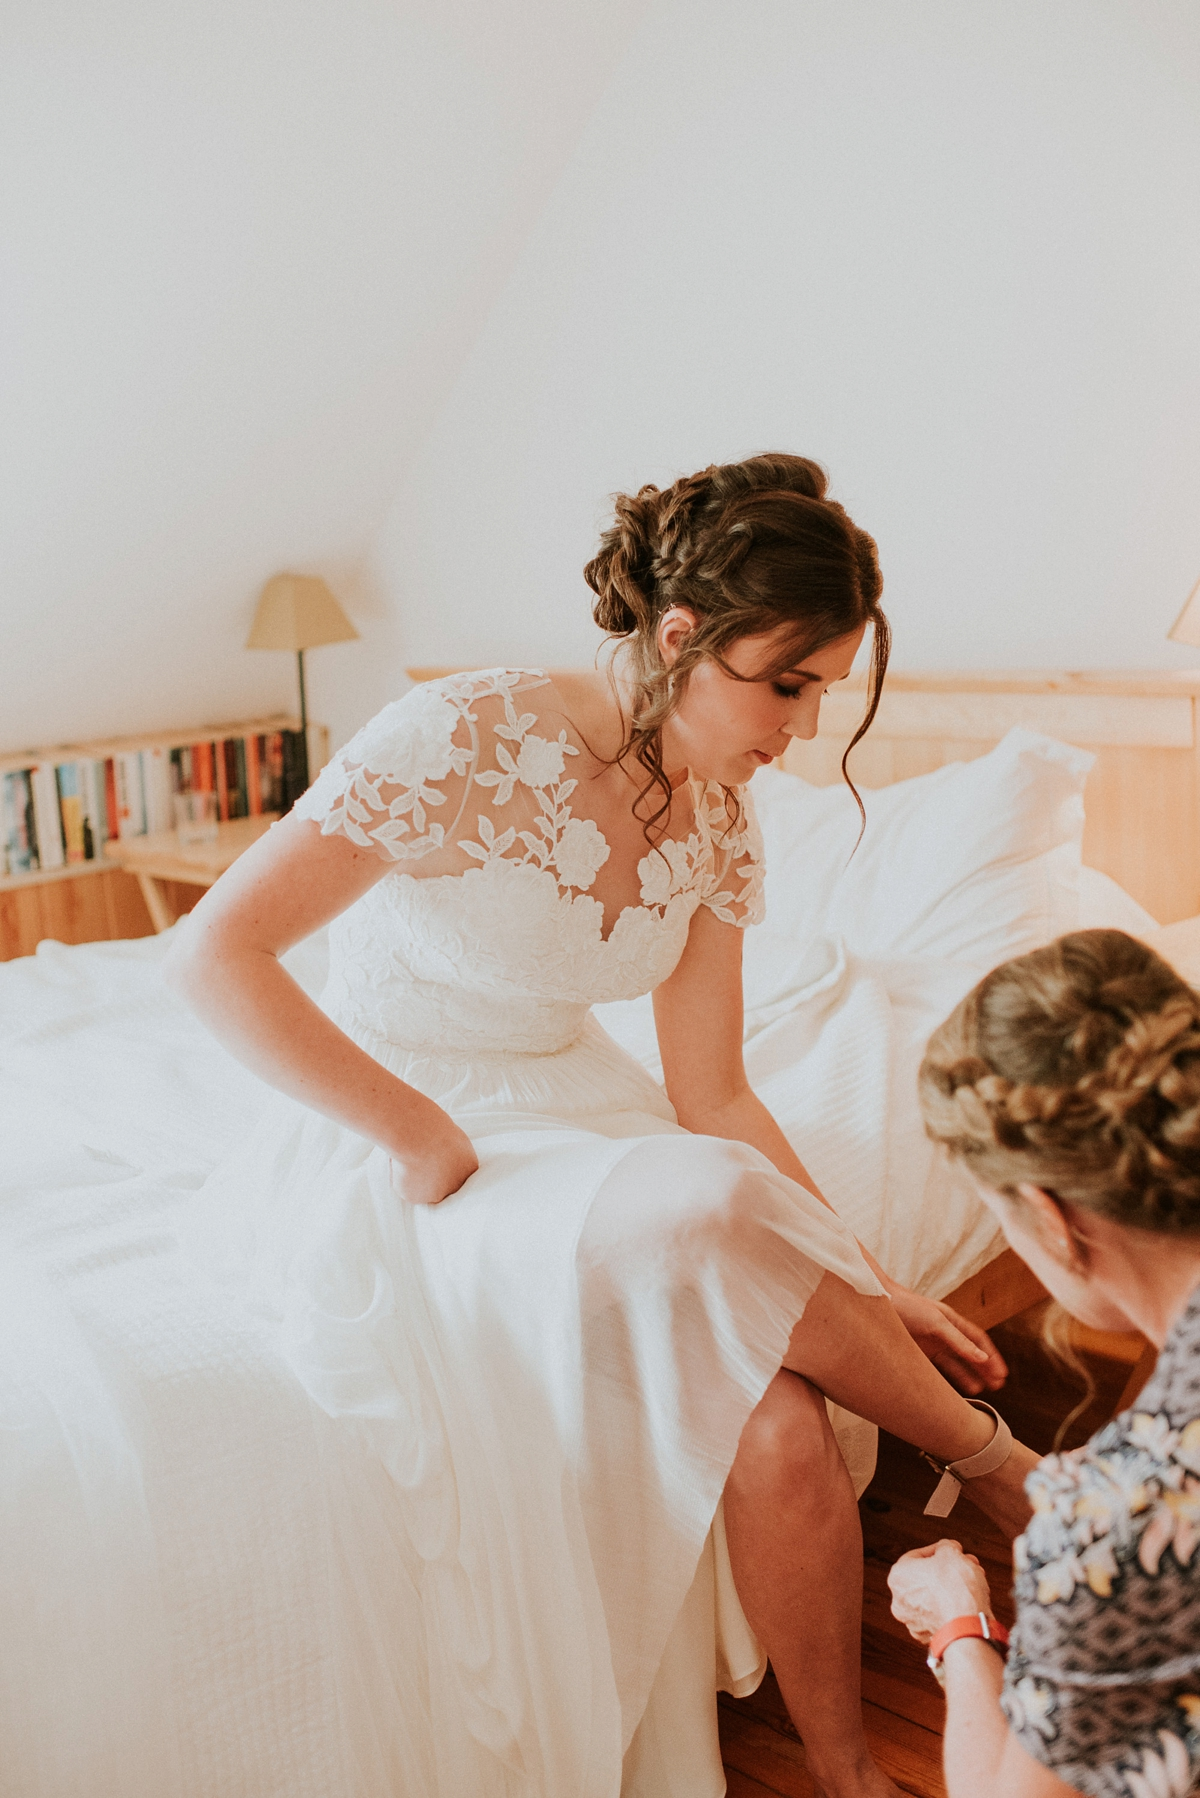 151a740511ea5 A Catherine Deane Dress Scandinavian inspired tipi wedding. Big Bouquet  Photography. - A Catherine